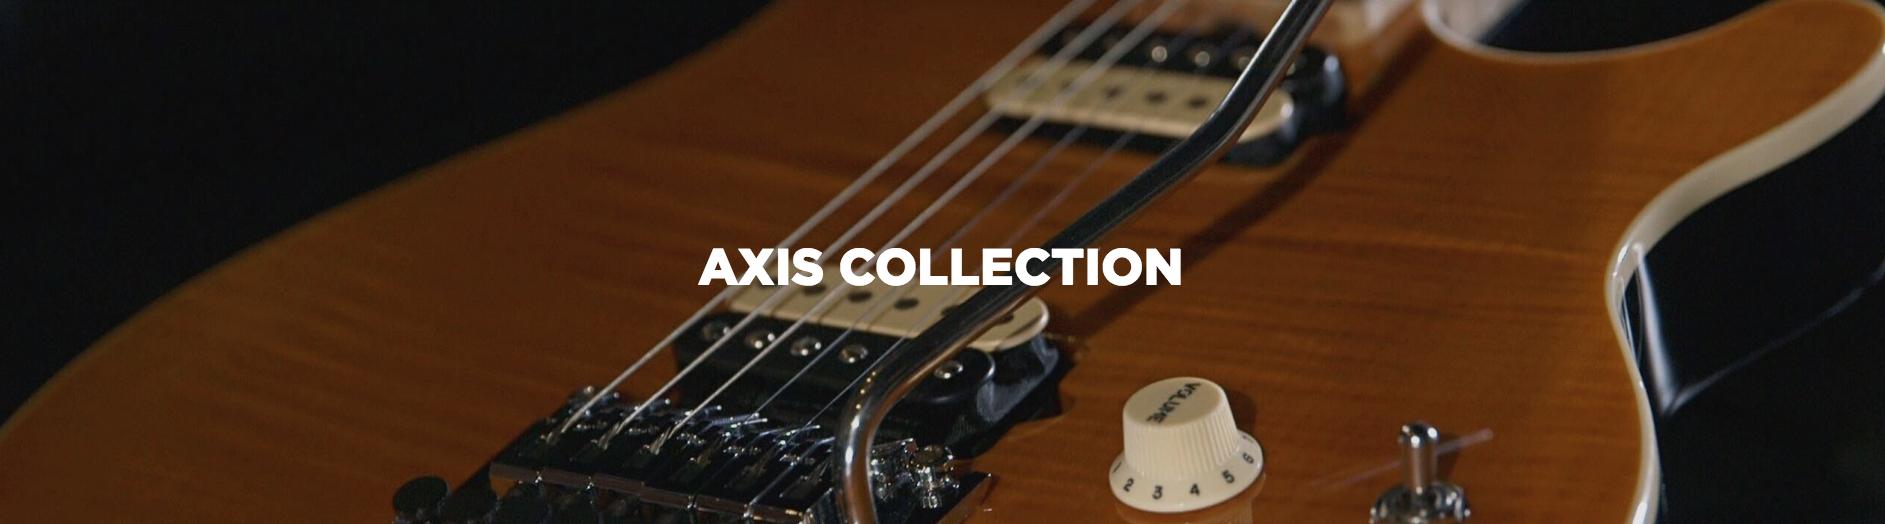 Ernie Ball Axis Collection